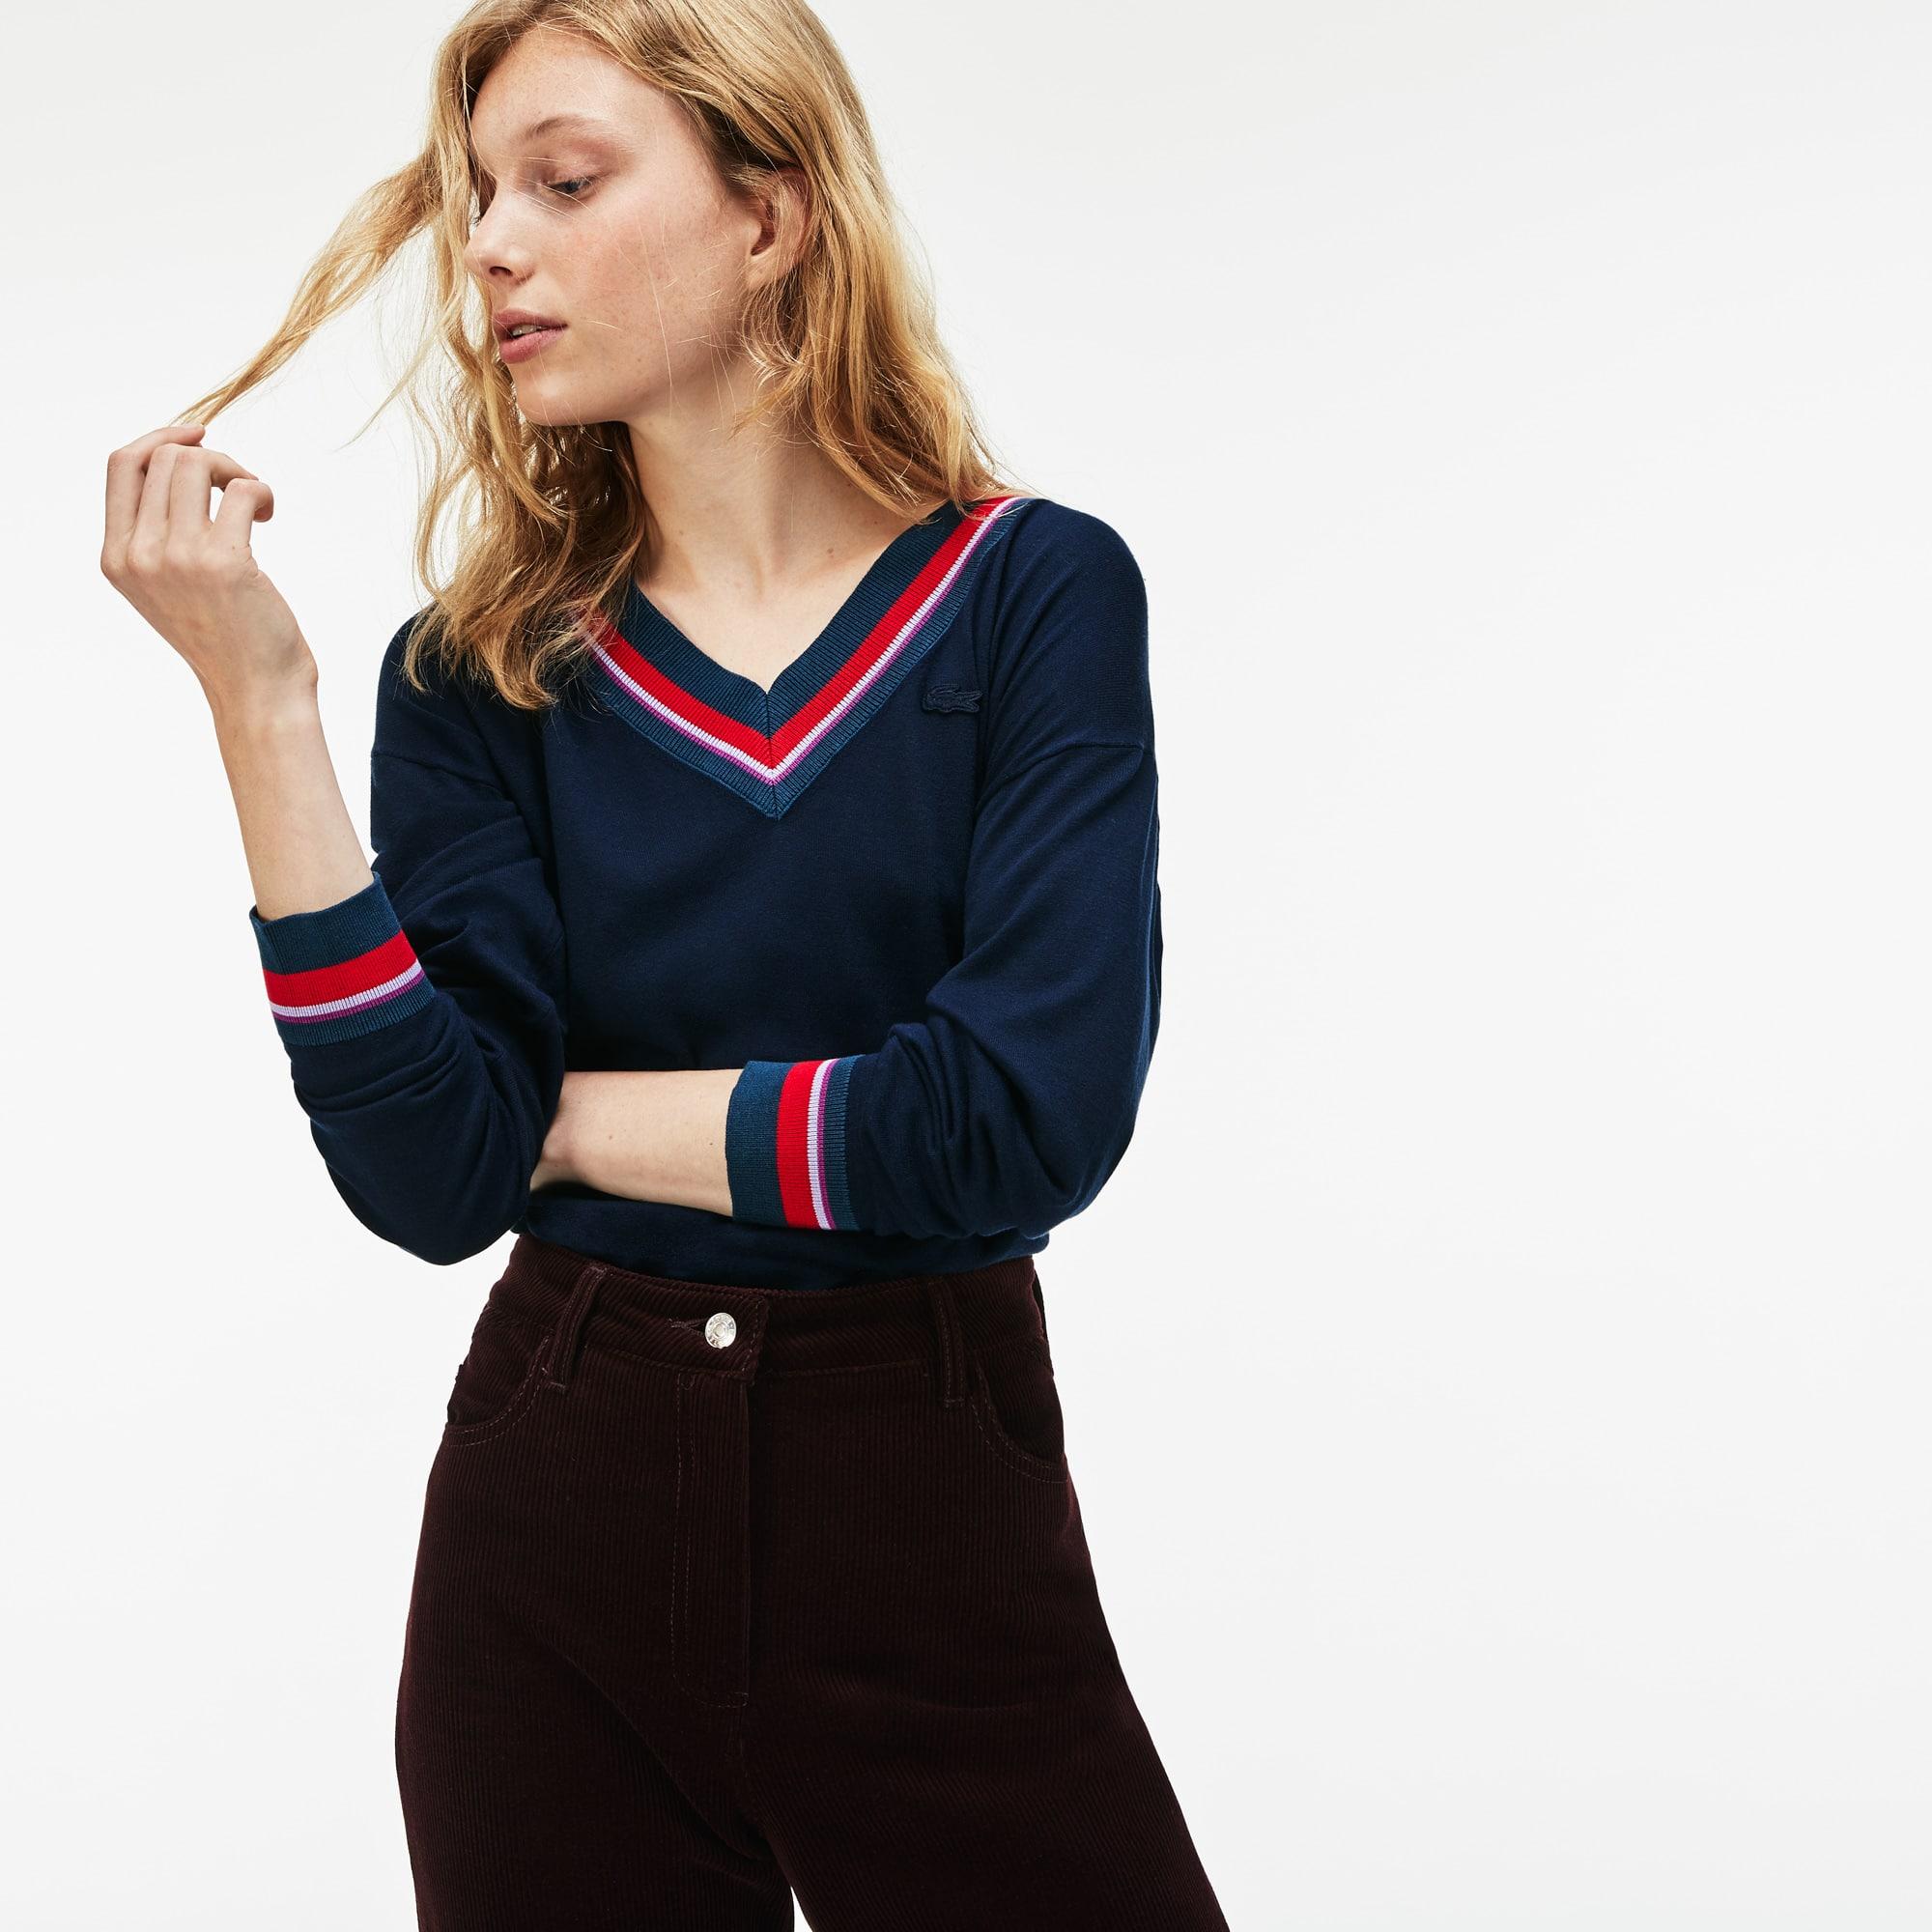 Women's V-neck Contrast Accent Silk Cotton Jersey Sweater